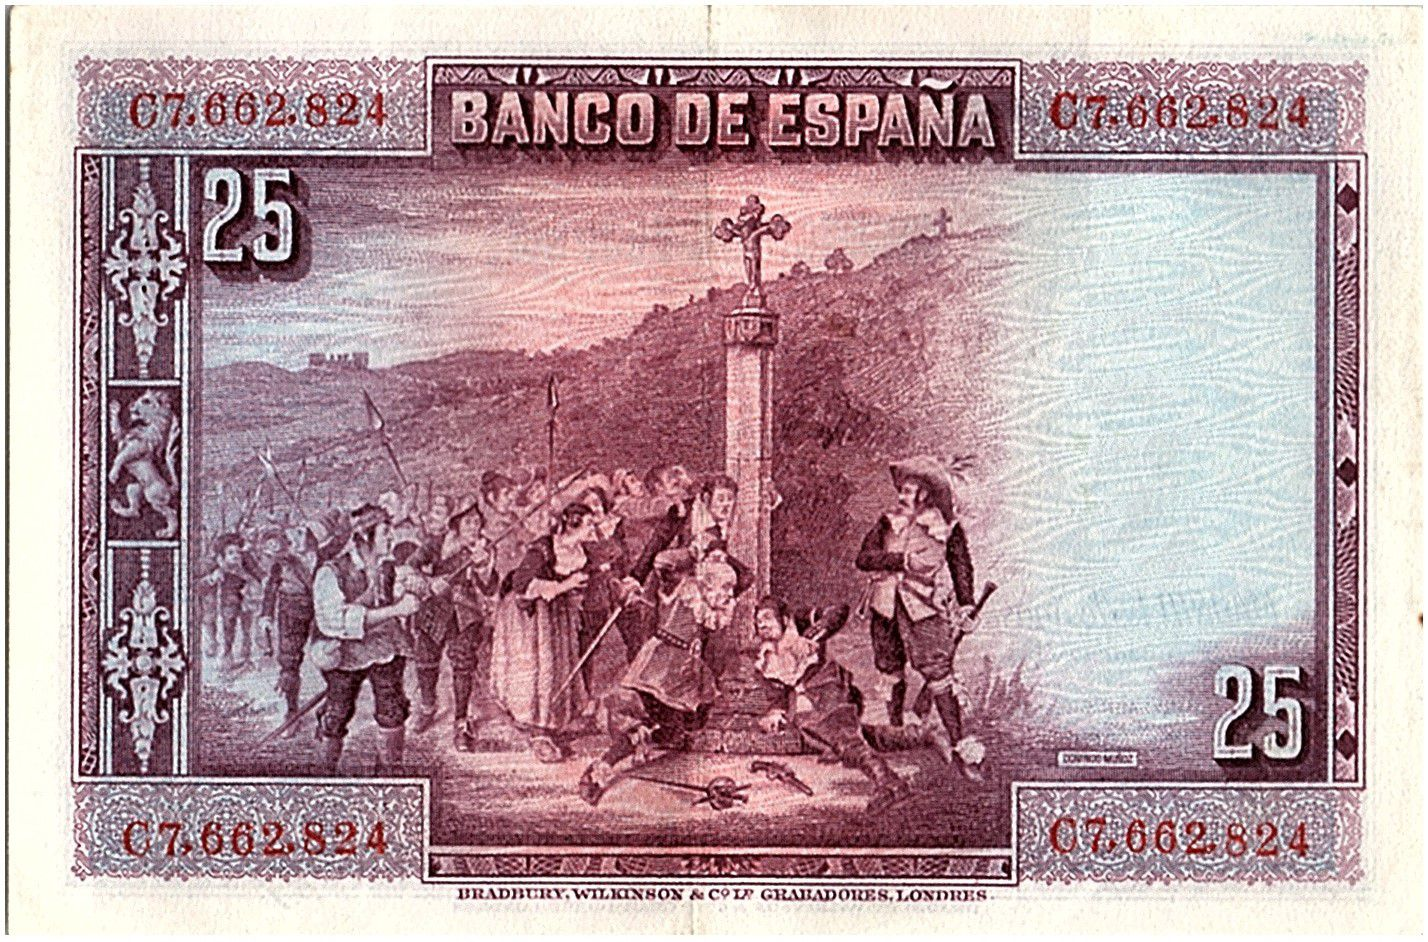 Espagne 25 Pesetas P. Calderon de la Barca - 1928 - Série C - TTB - P.74